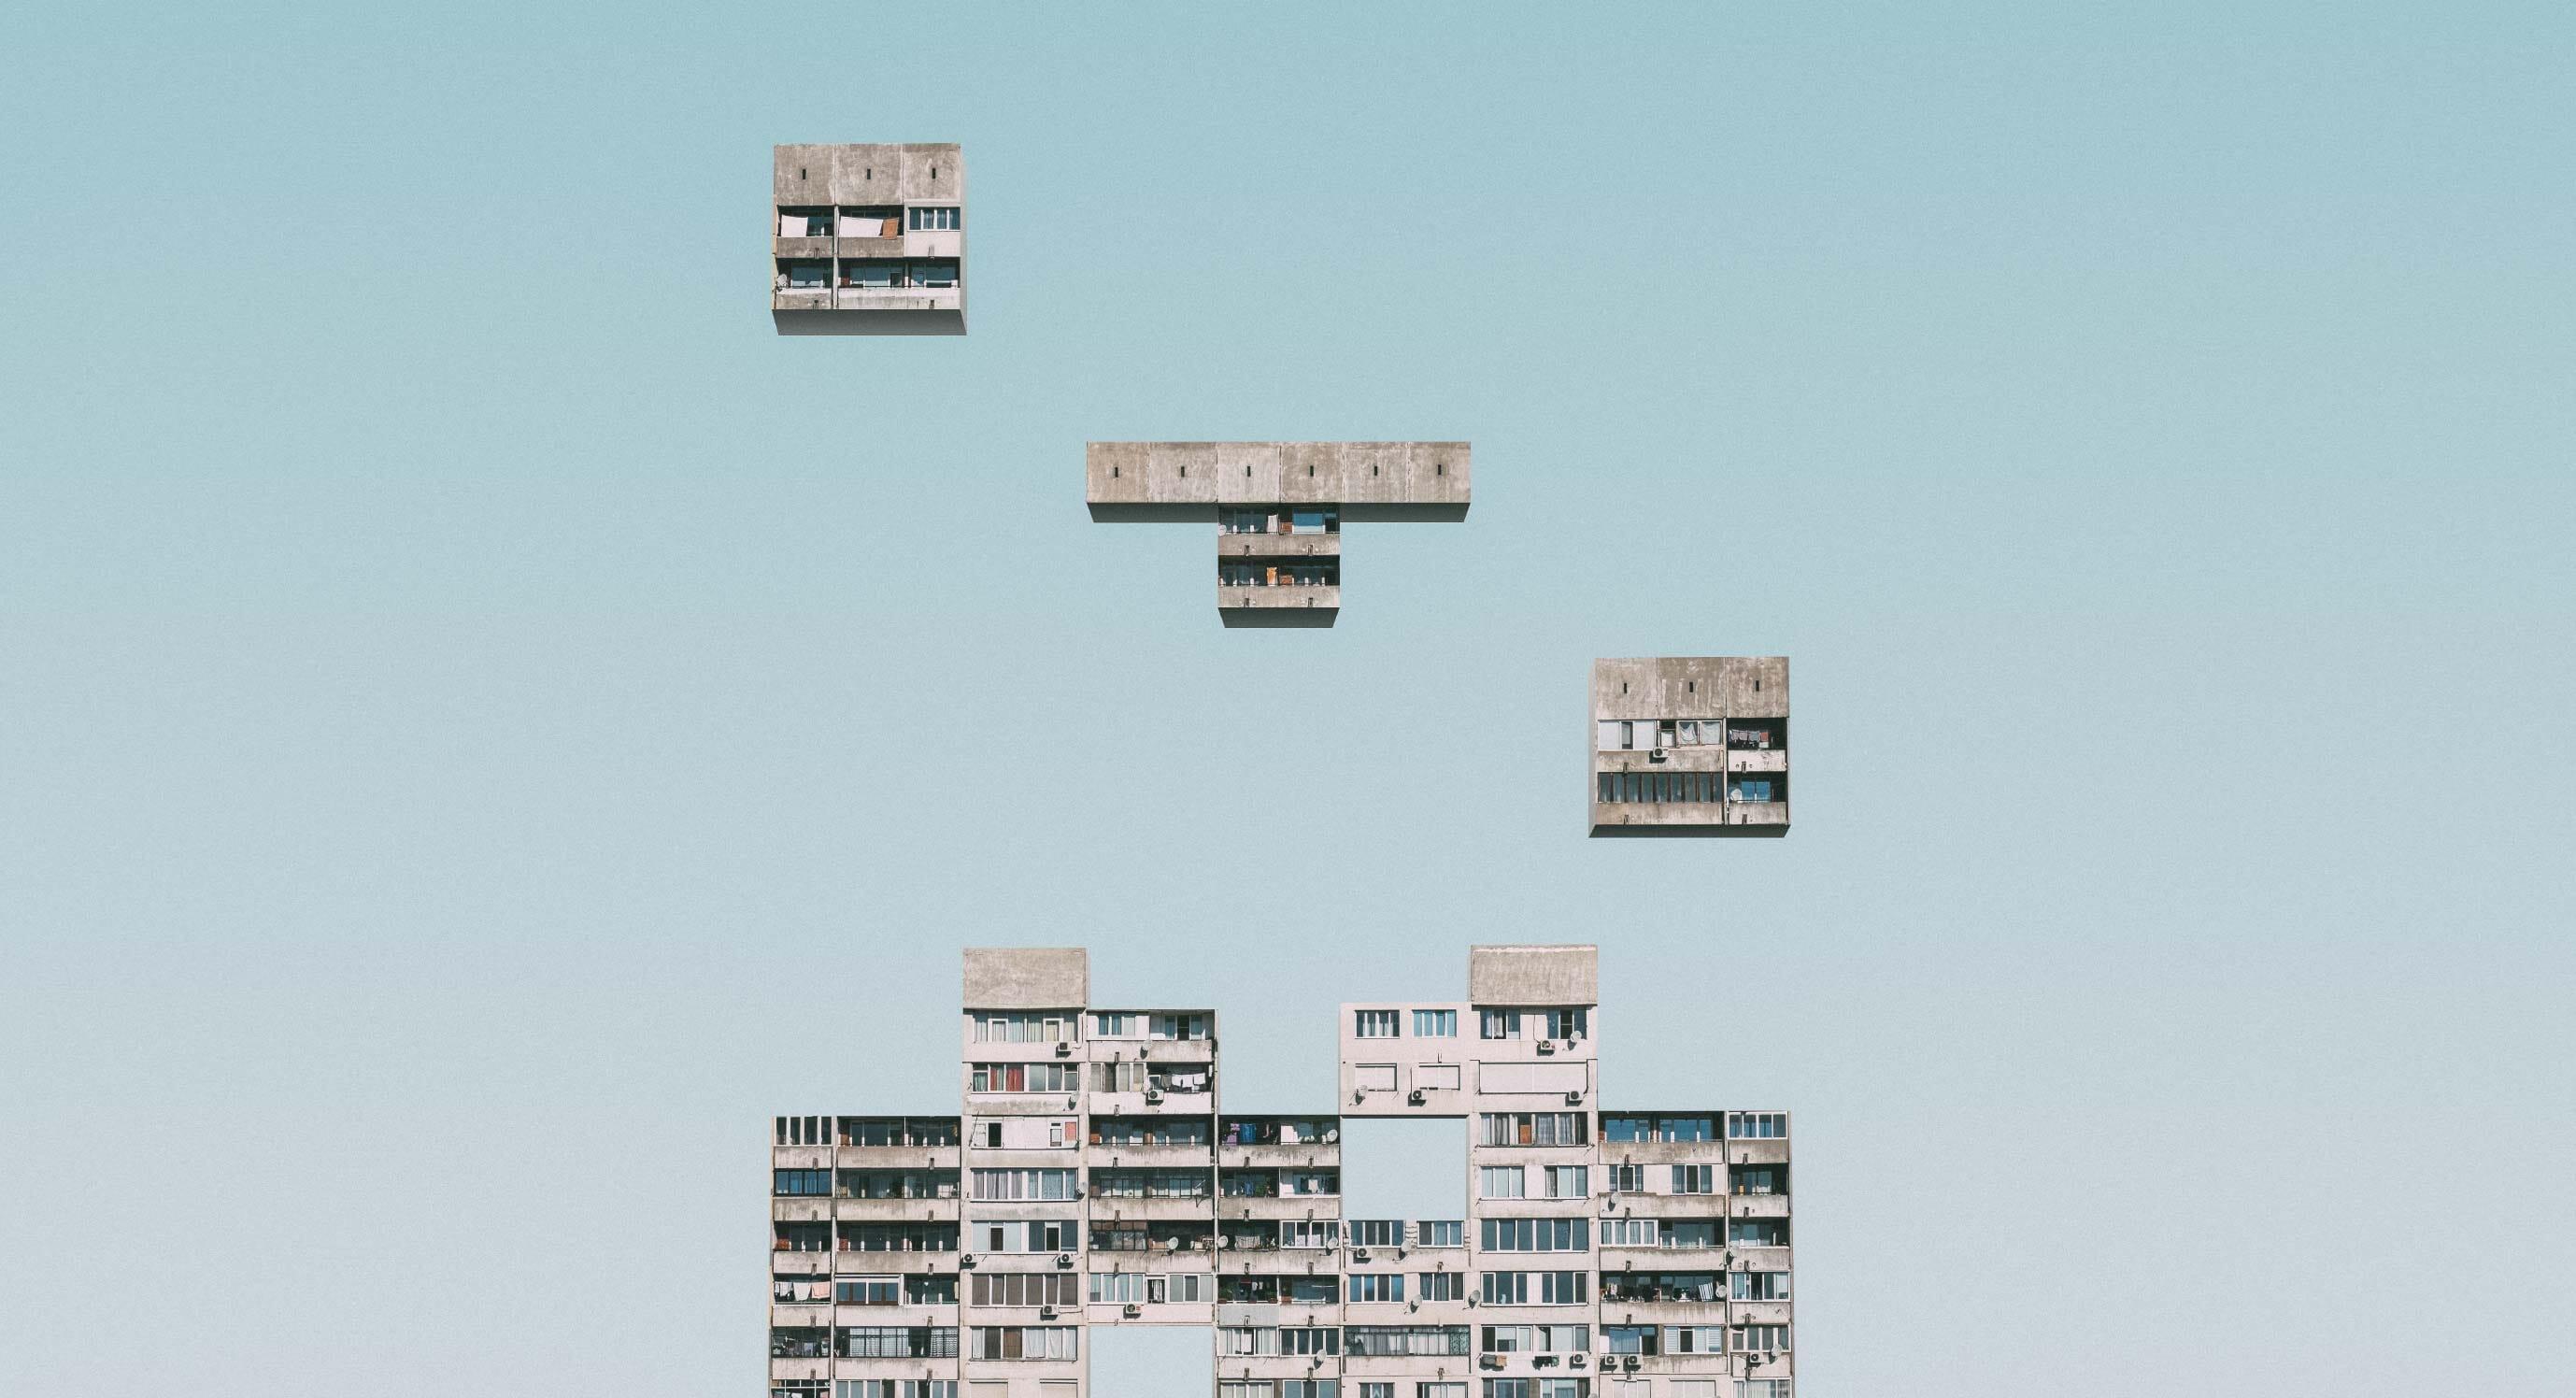 Urban Tetris by Mariyan Atanasov